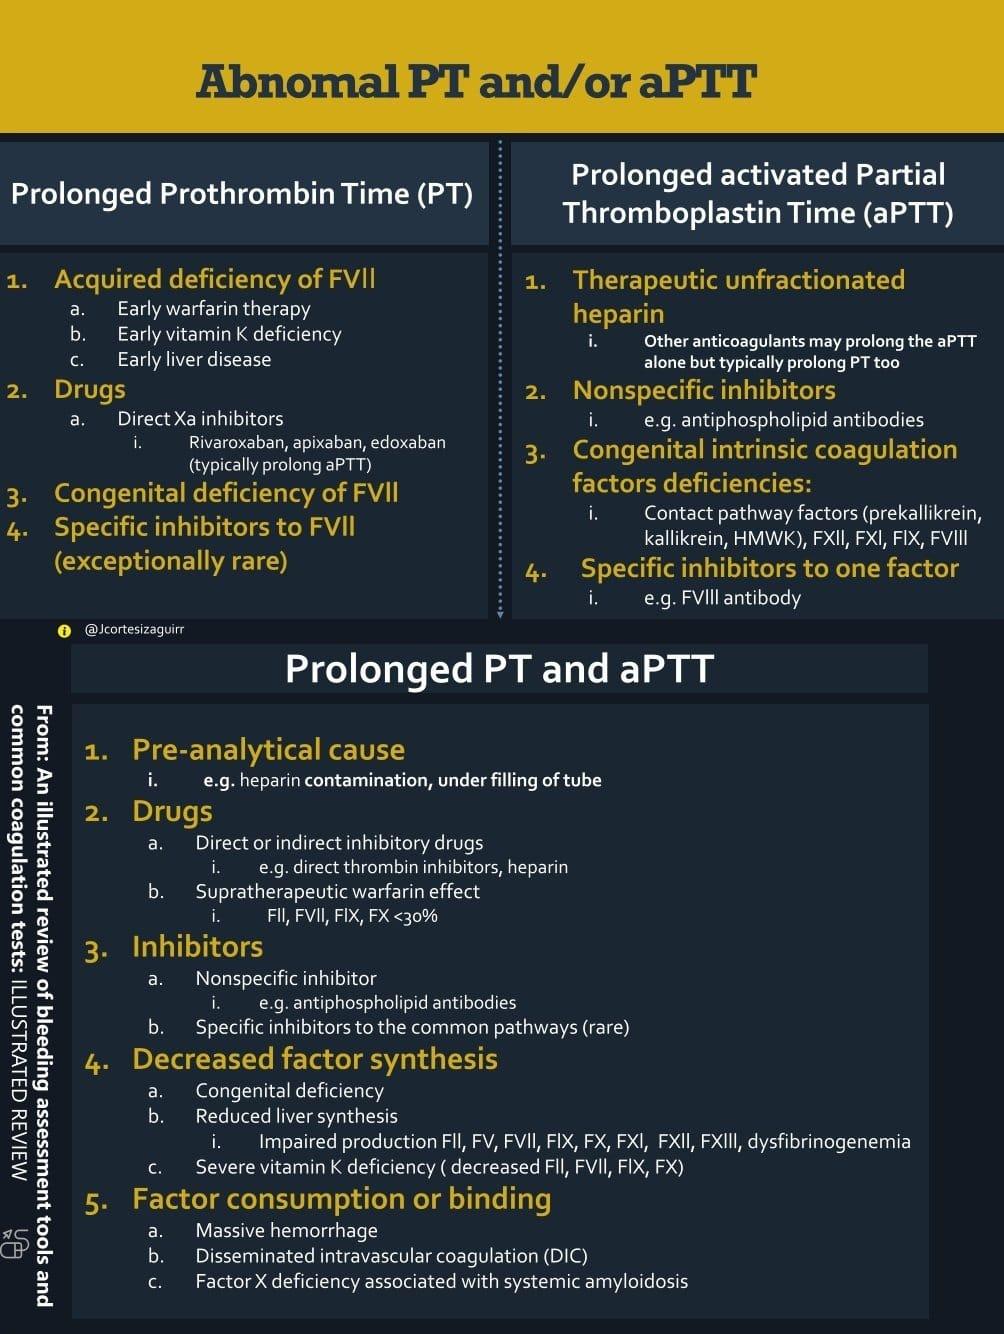 Abnormal PT and APTT